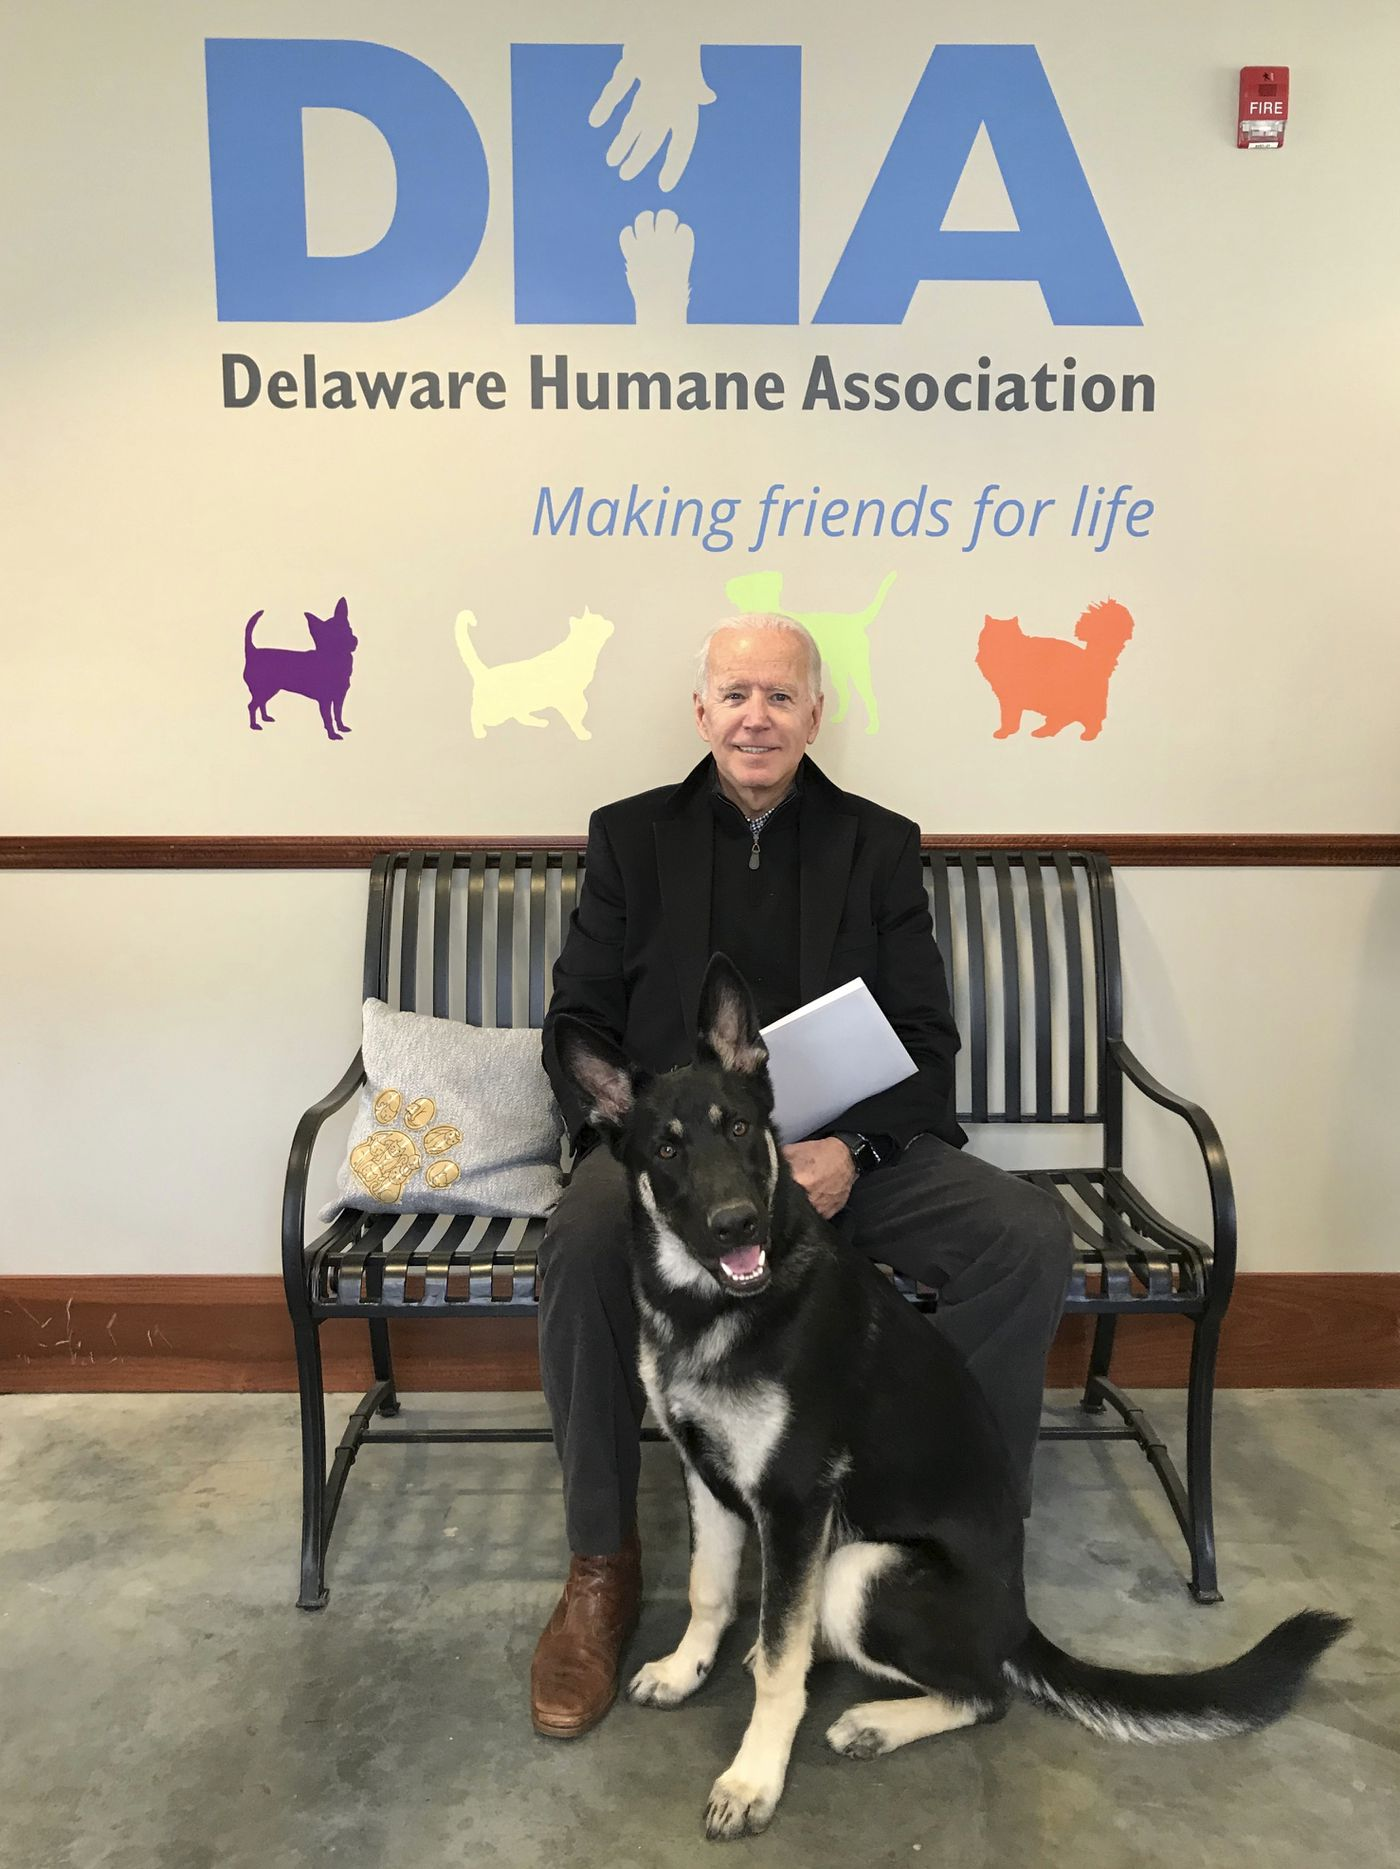 Former Vice President Joe Biden adopts new dog